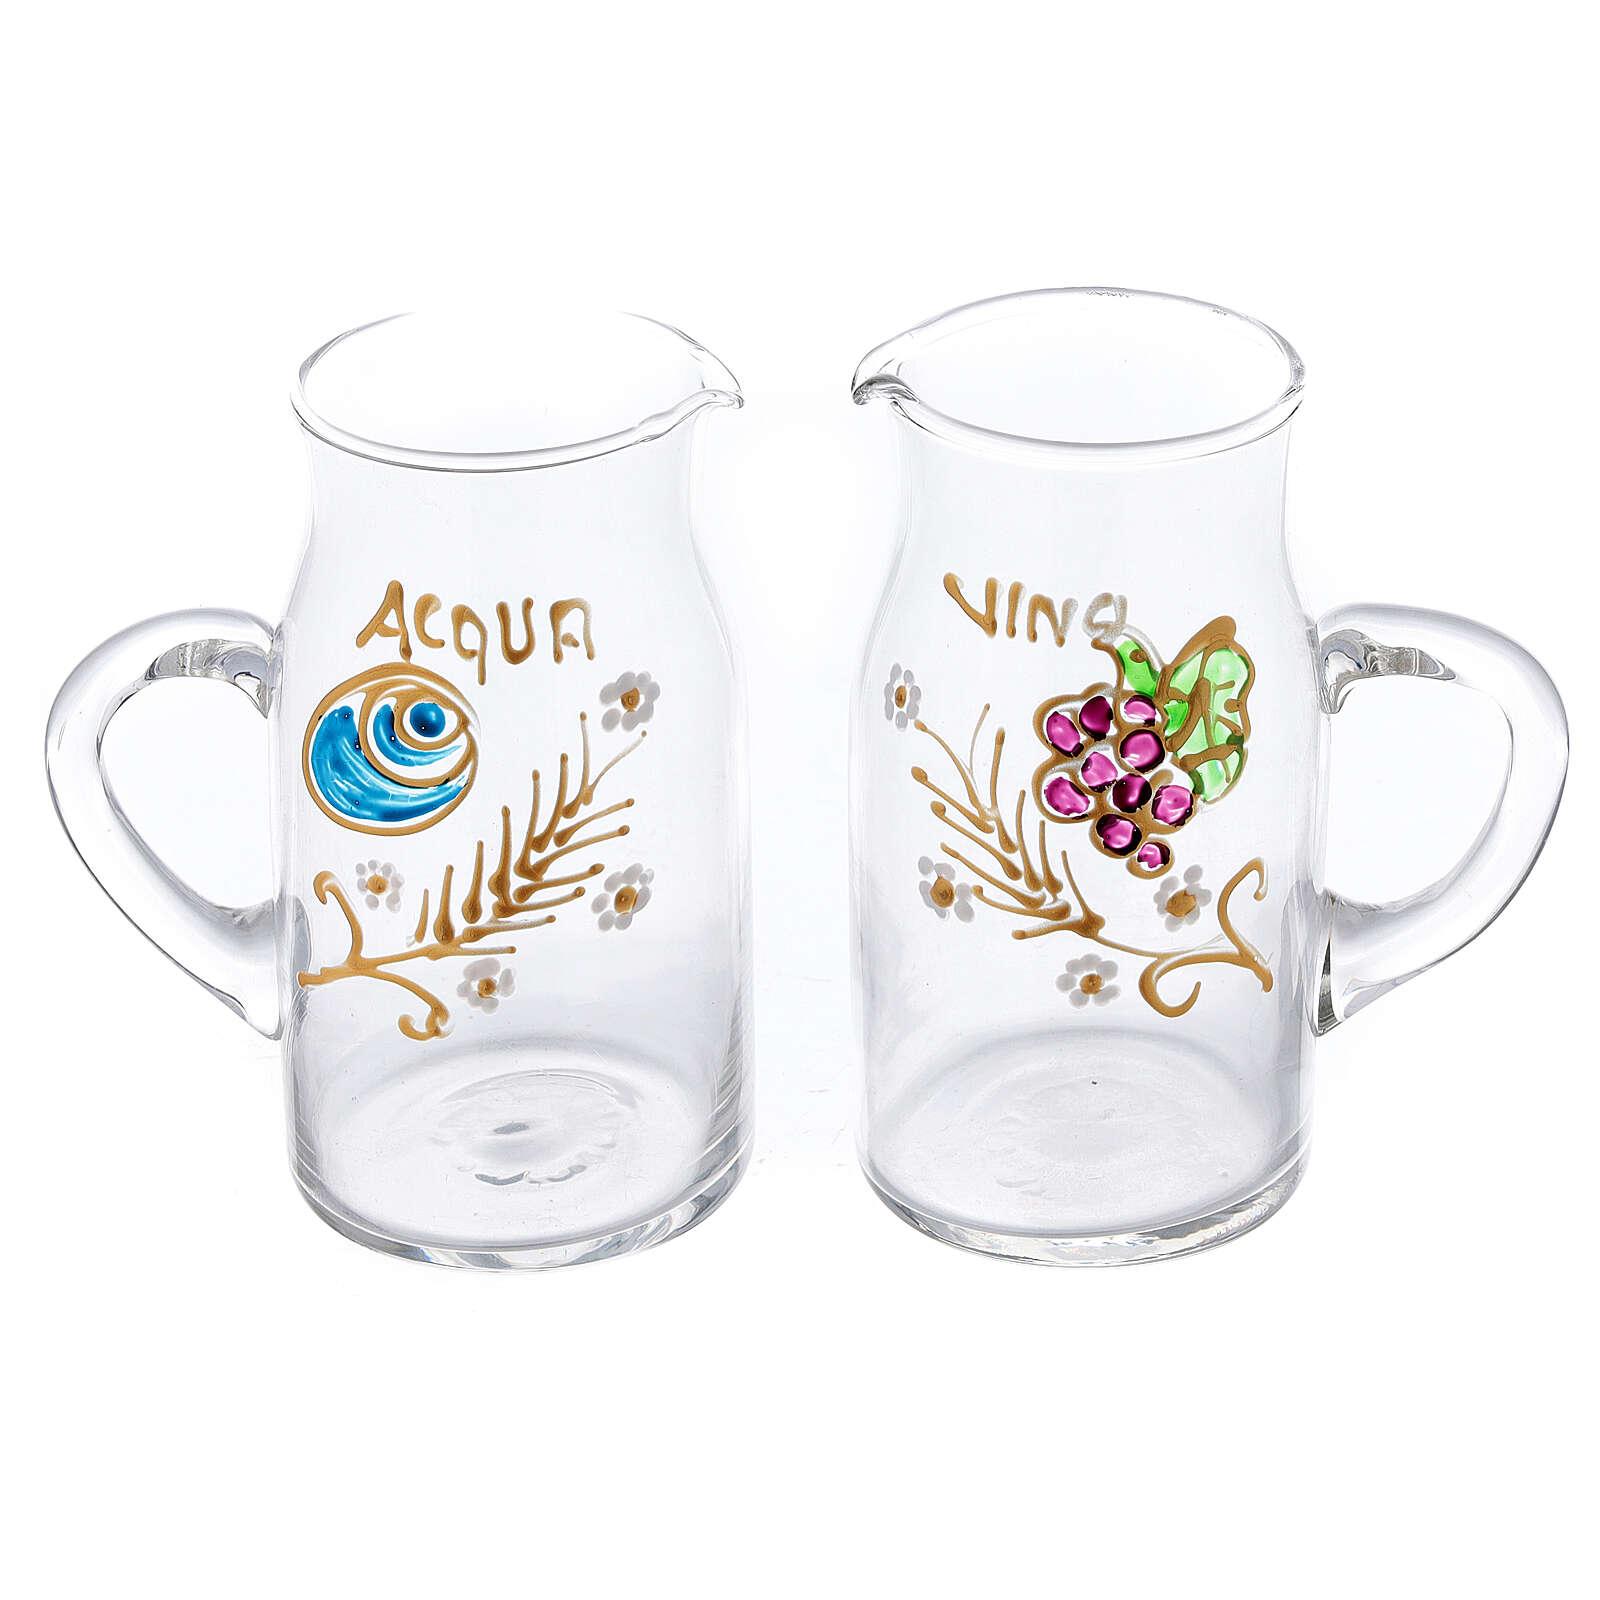 Pareja vinajeras Fiesole forma cilíndrica vidrio pintadas a mano ml 130 4